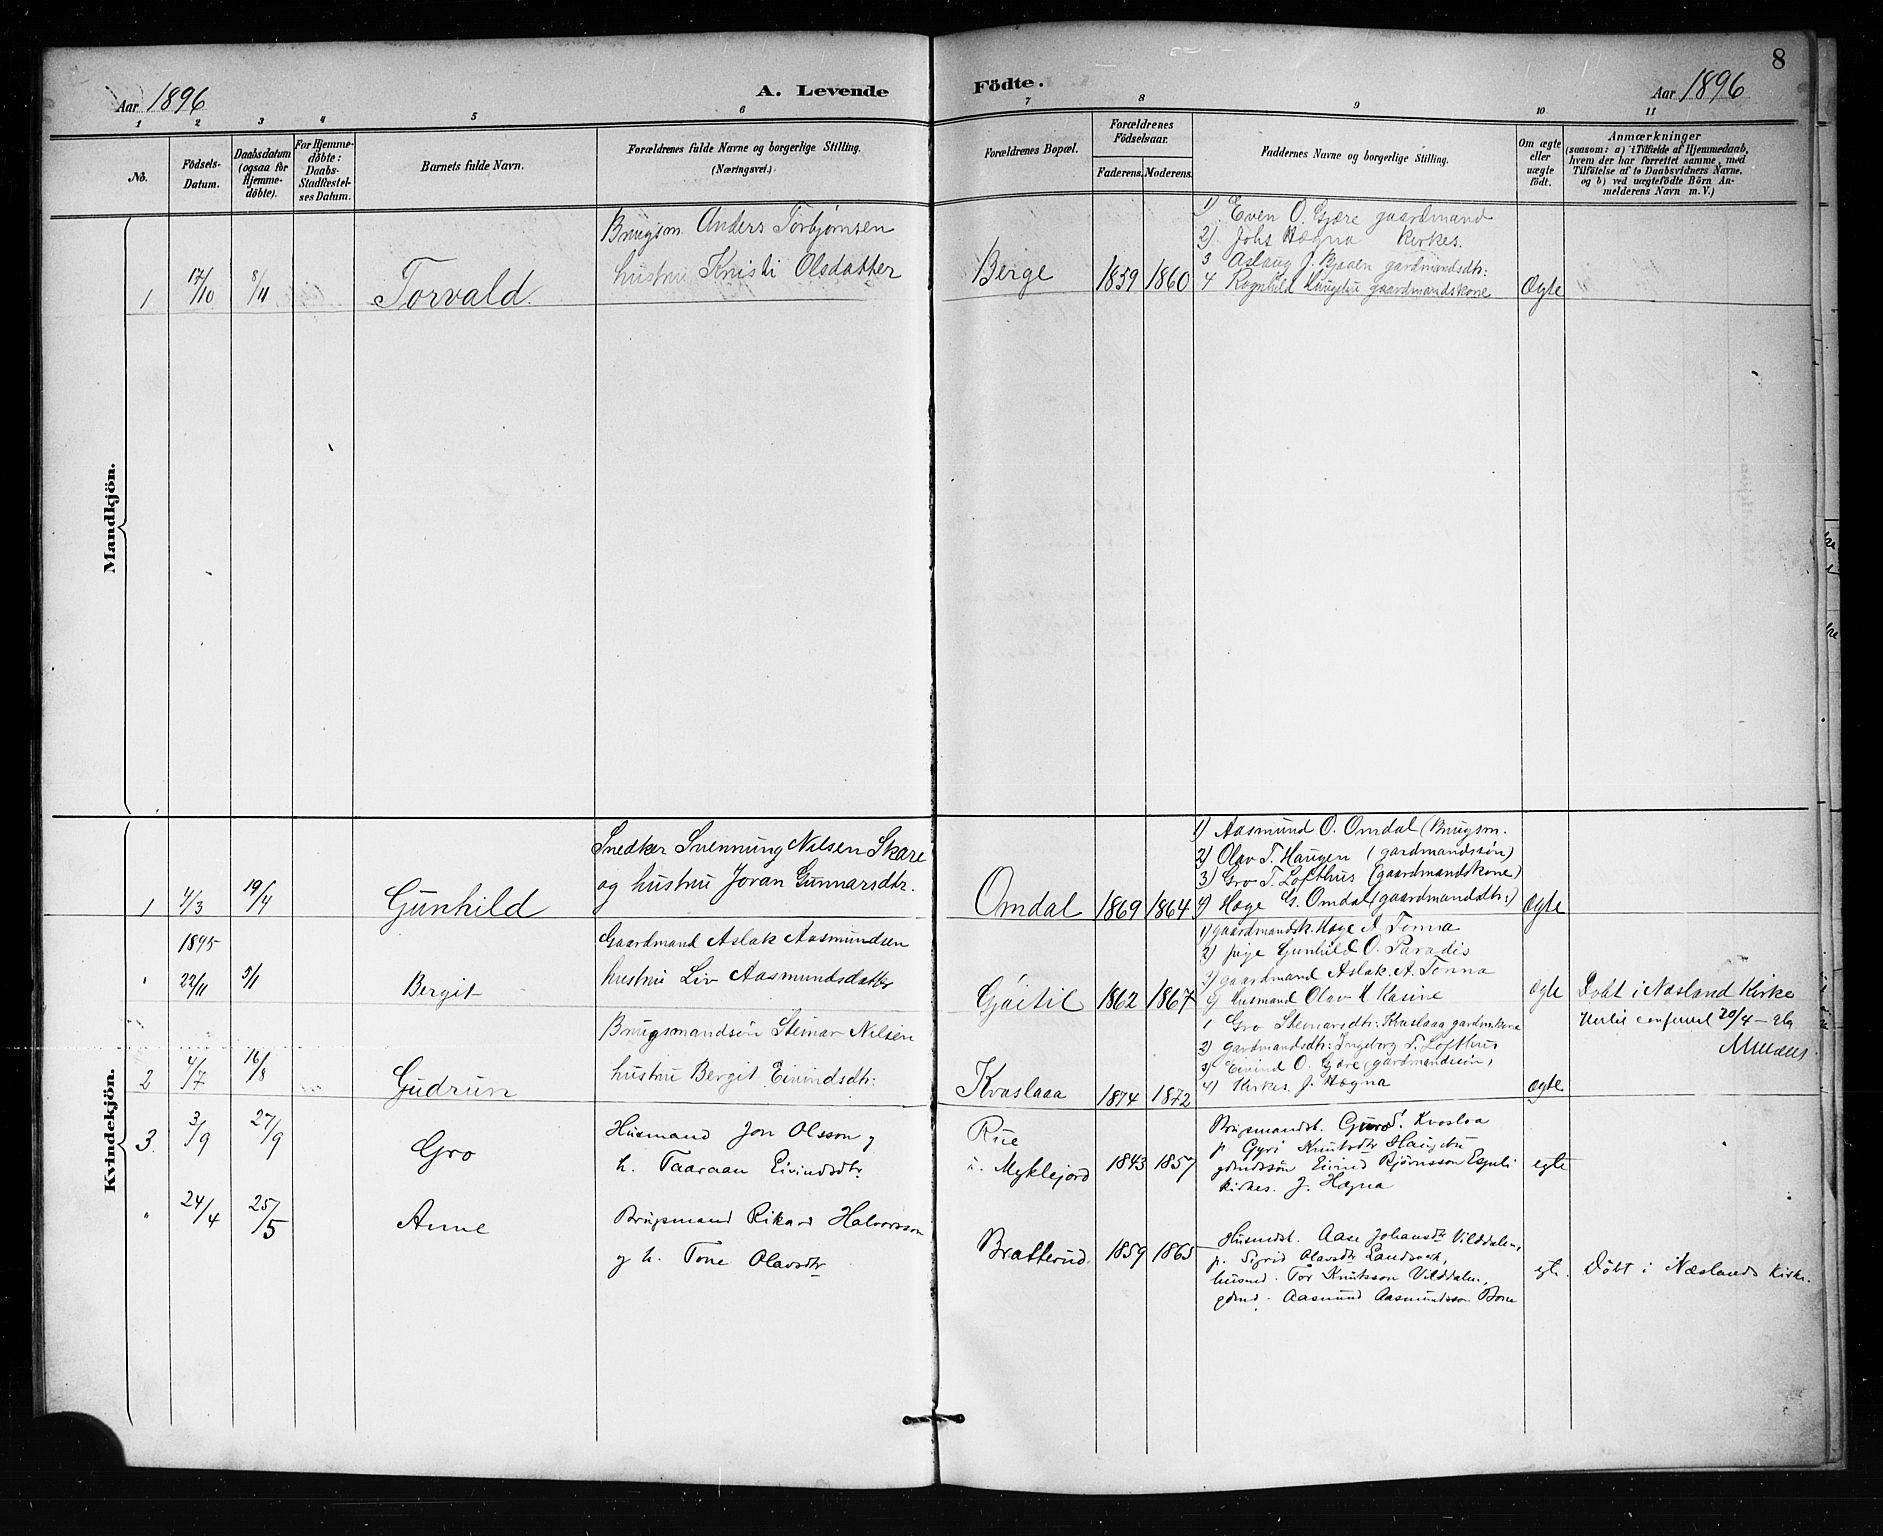 SAKO, Lårdal kirkebøker, G/Gb/L0003: Klokkerbok nr. II 3, 1889-1920, s. 8